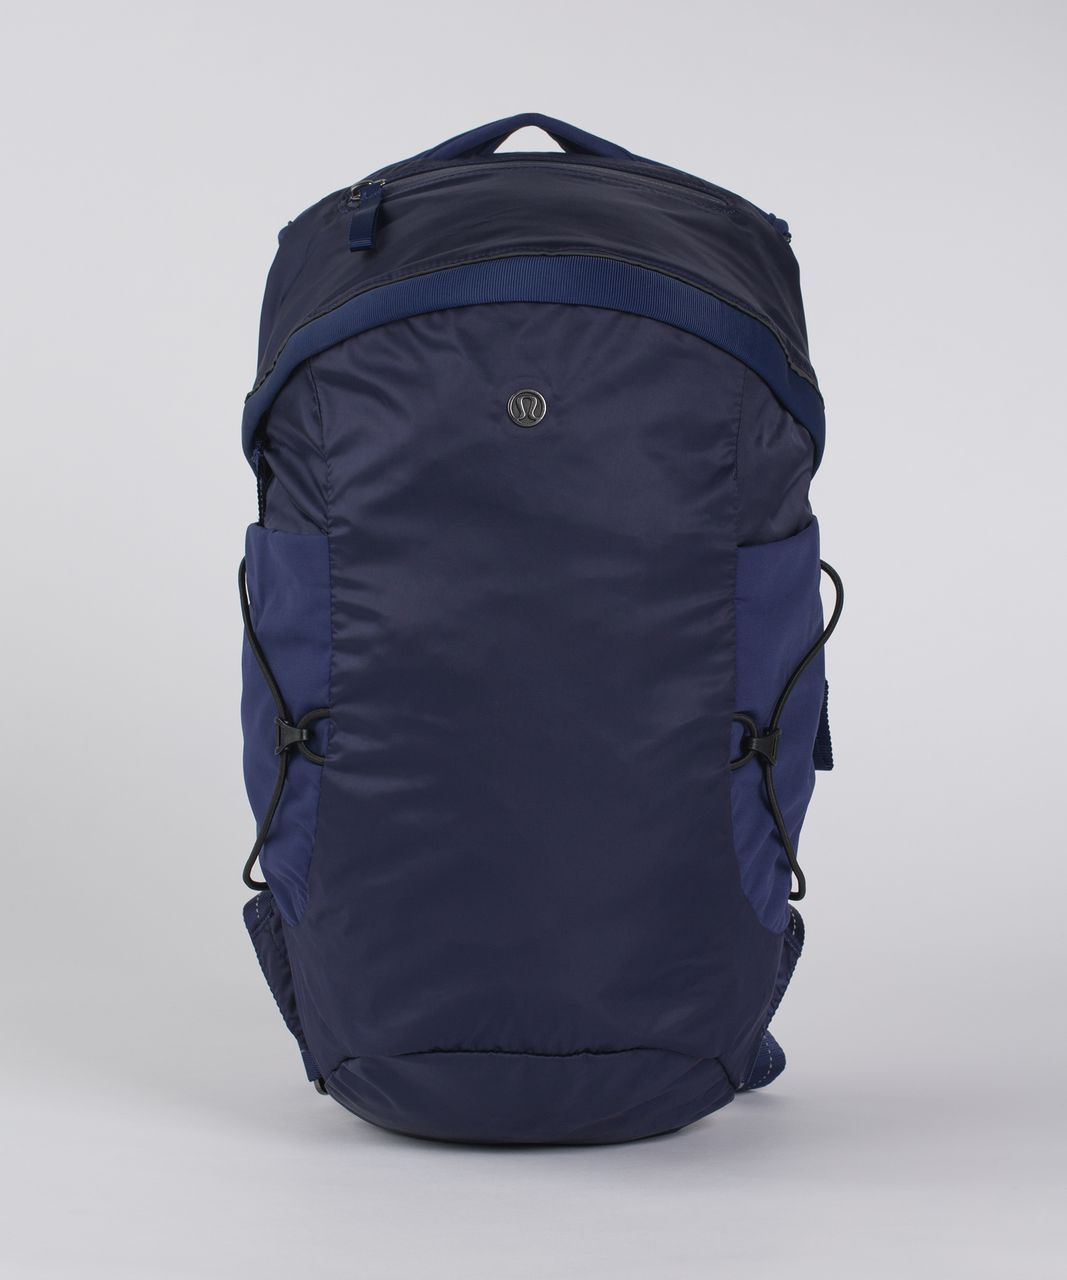 eb1d02b3a5e6 Lululemon Run All Day Backpack II  13L - Blueberry Jam - lulu fanatics